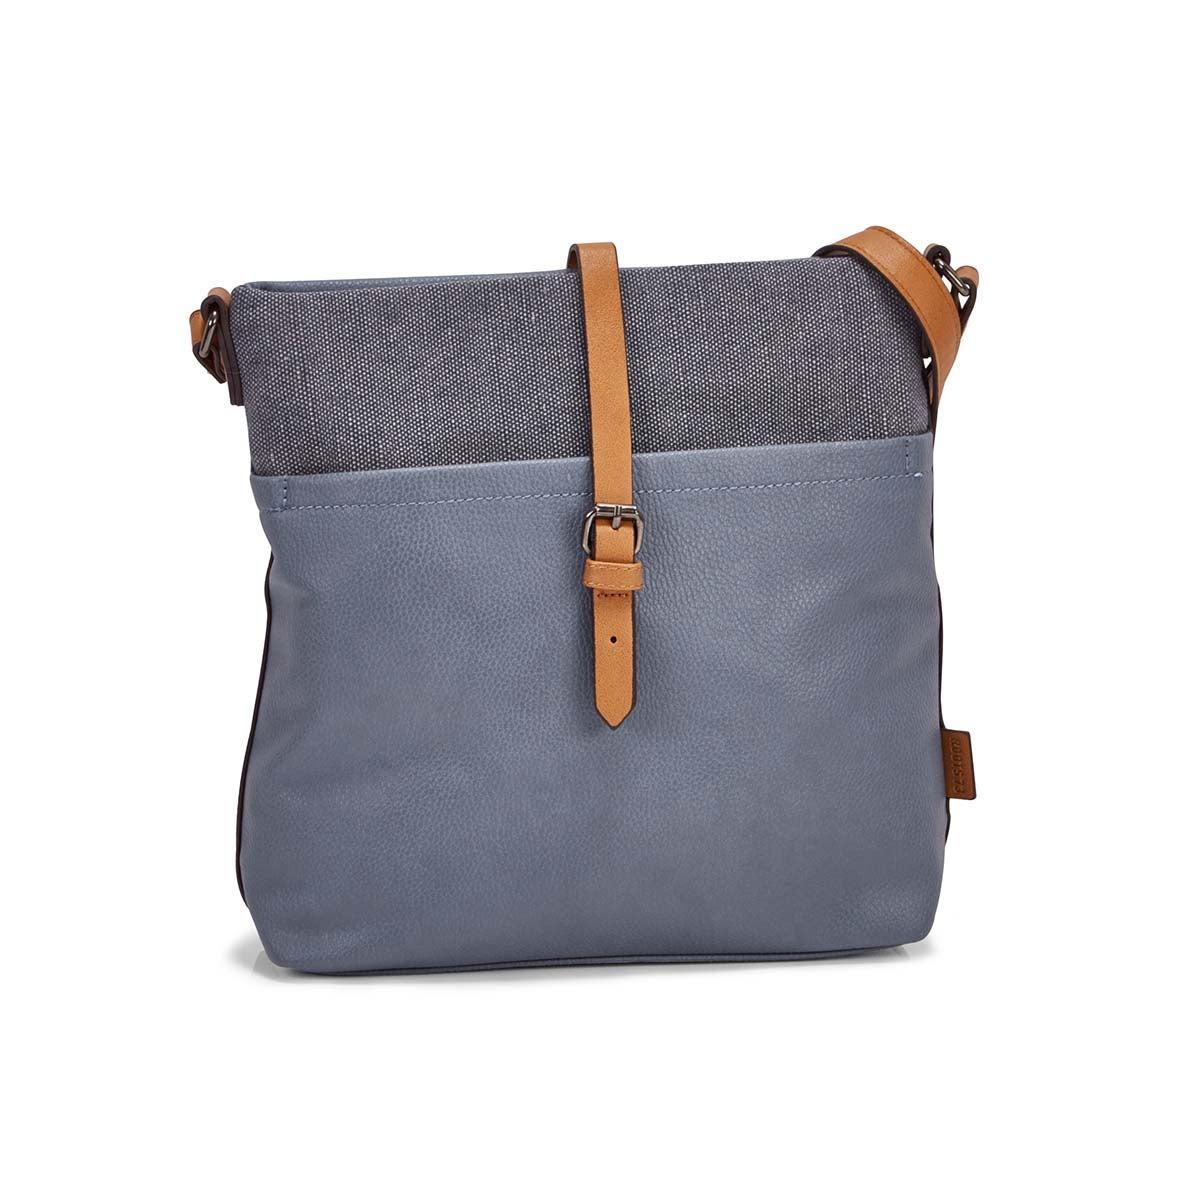 Women's R5530 NORTH/SOUTH light blue crossbody bag